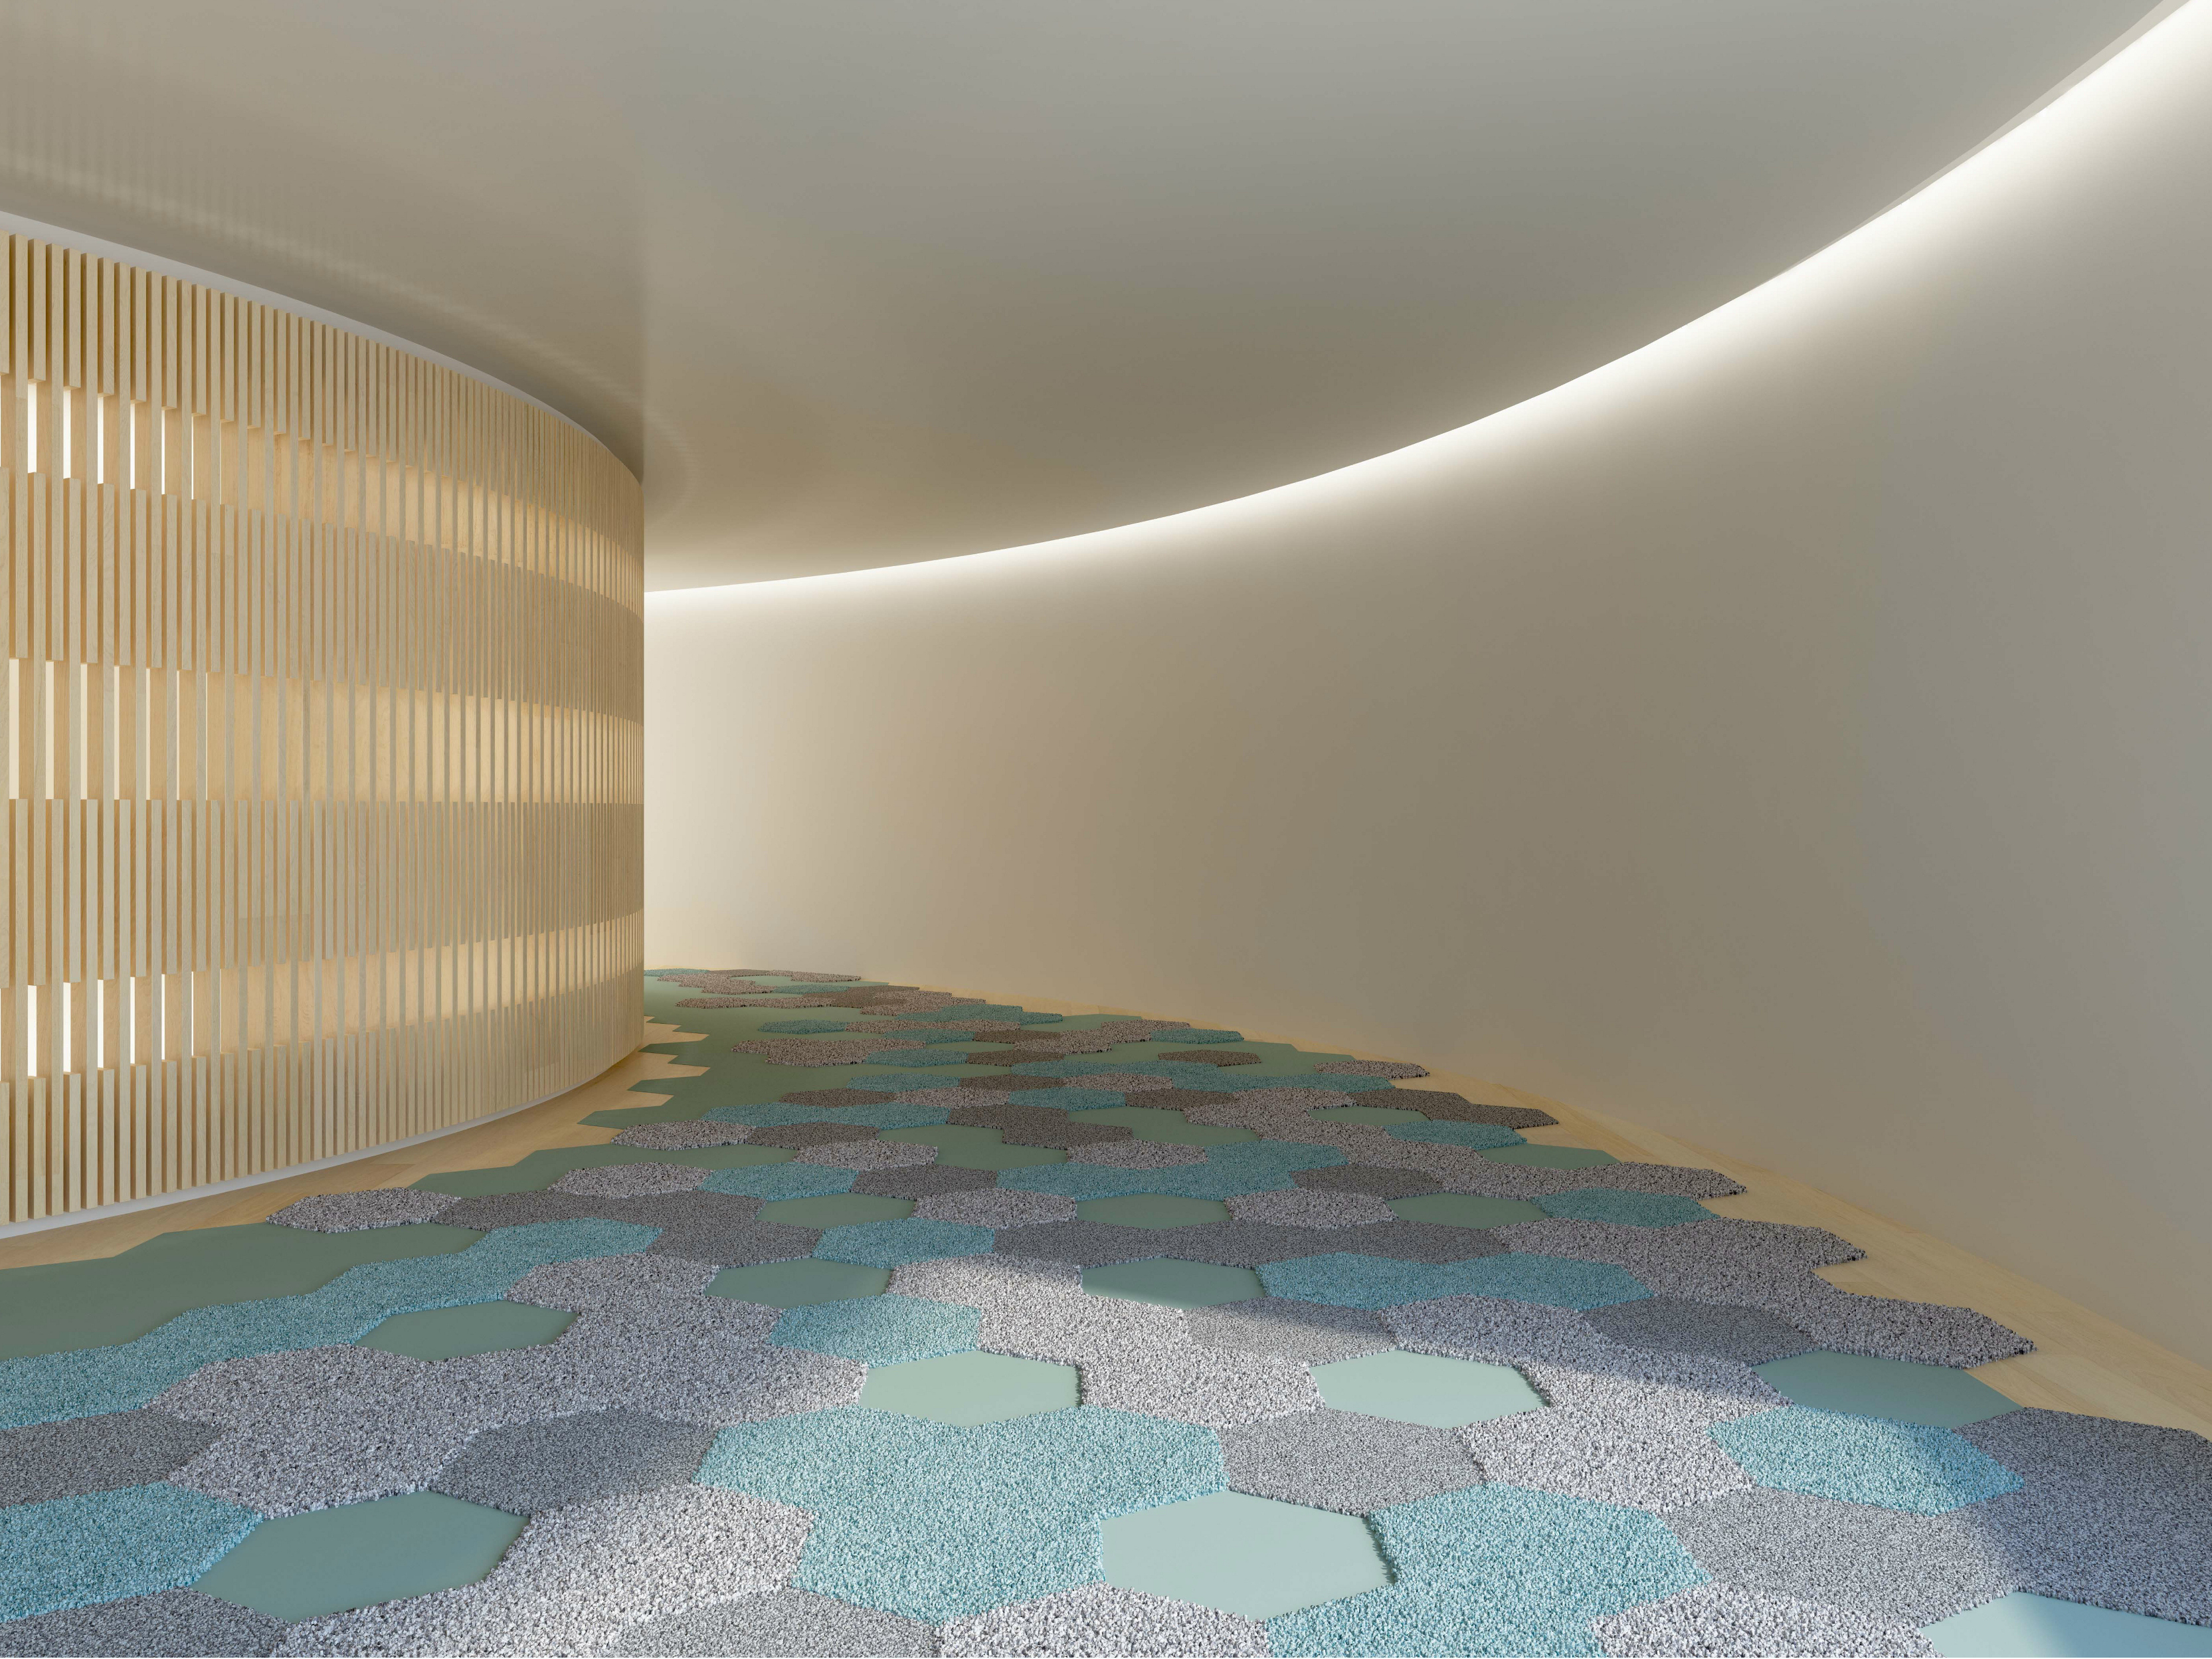 moquette tapis prisma by vorwerk co teppichwerke. Black Bedroom Furniture Sets. Home Design Ideas